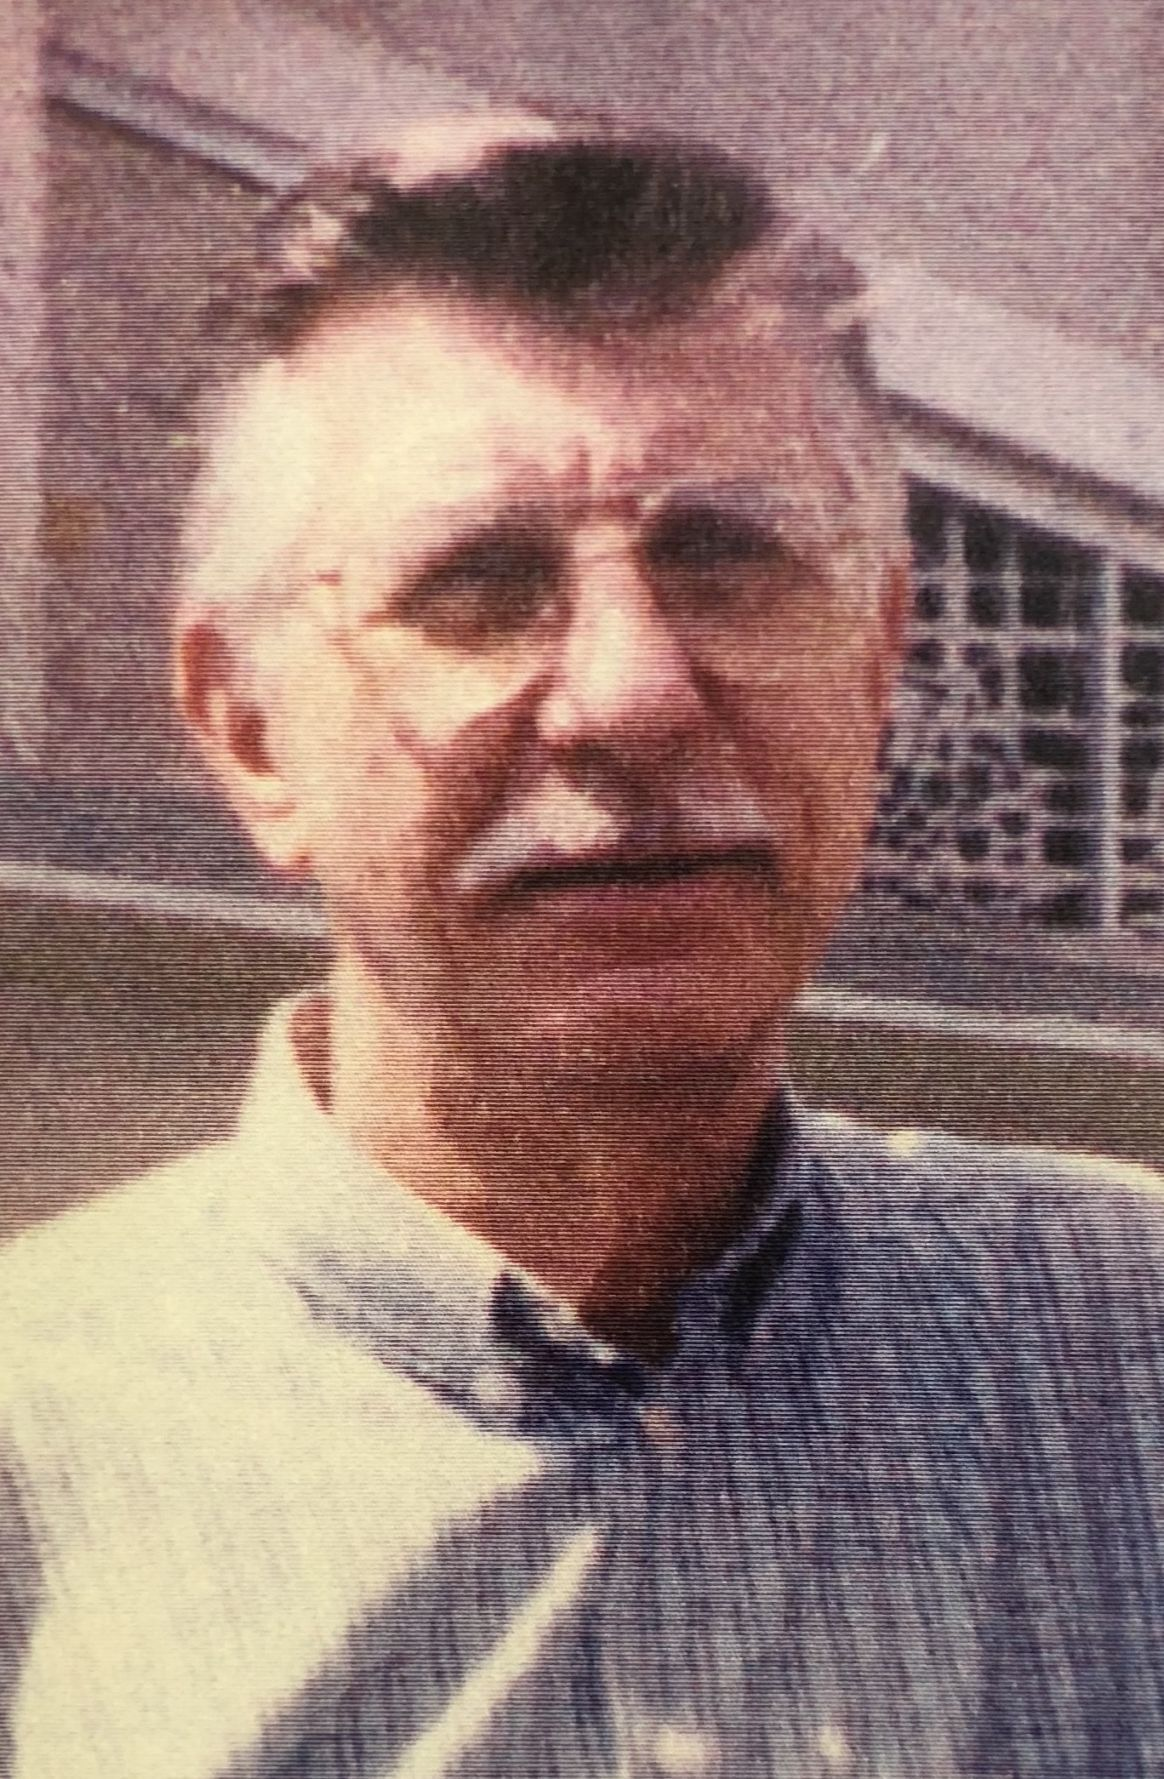 Lyle W. Mohr March 13, 1932 -January 12, 2018 Lyle